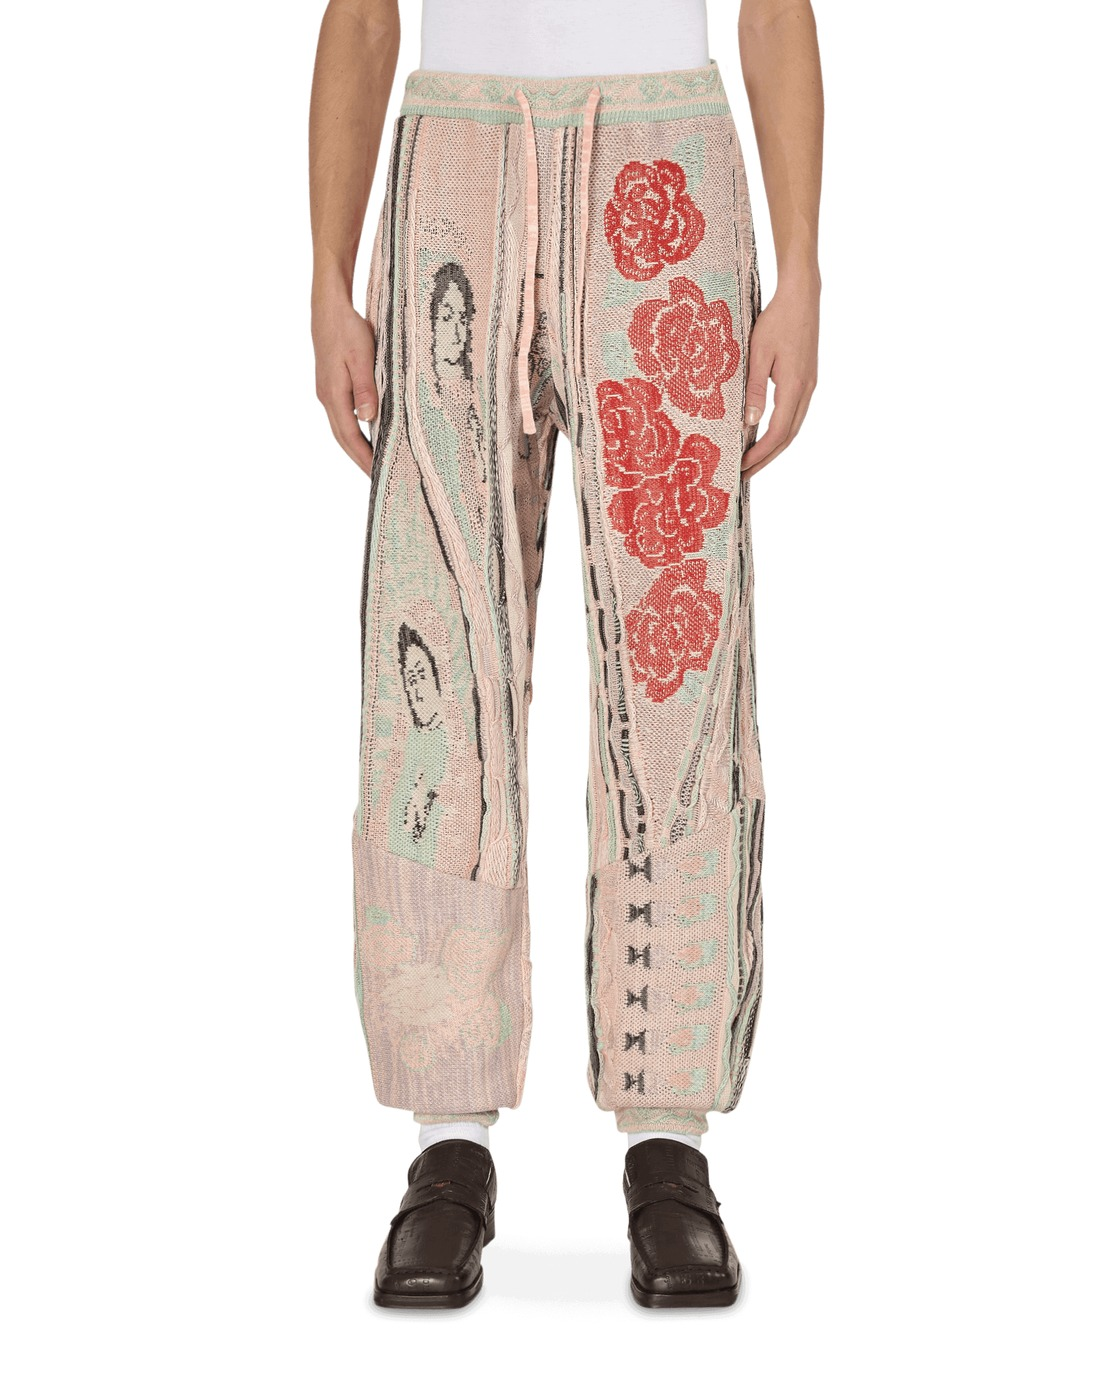 Kapital 7g Virgin Mary Gaudy Knit Pants Lightpink